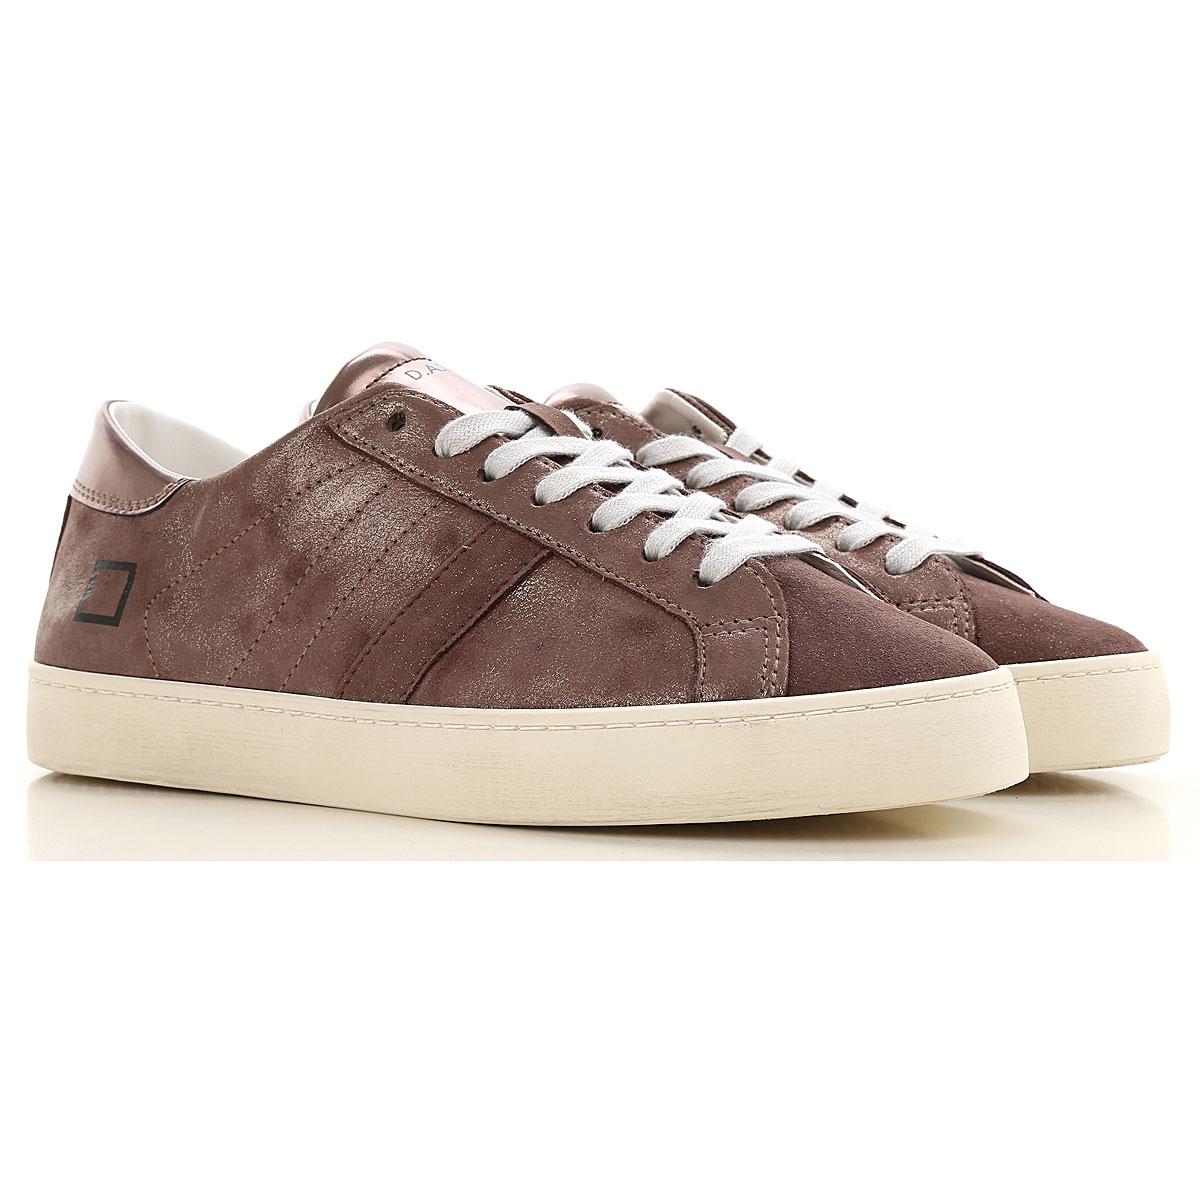 D.A.T.E. Sneakers for Women, Metal bronze, Leather, 2019, US 6 - UK 3 5 - EU 36 - JP 22 5 US 6 5 - UK 4 - EU 37 - JP 23 US 7 5 - UK 5 - EU 38 - JP 24